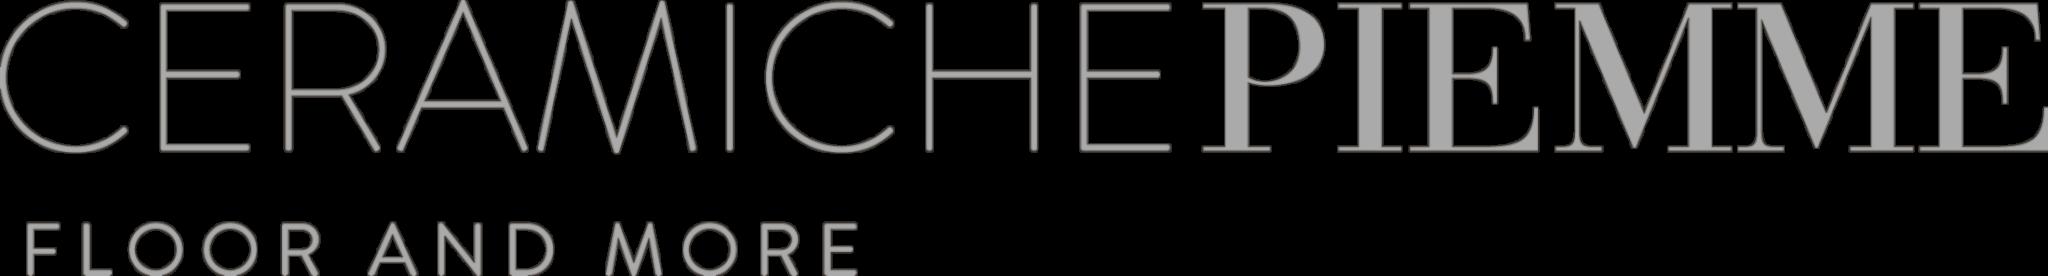 ceramiche piemme logo